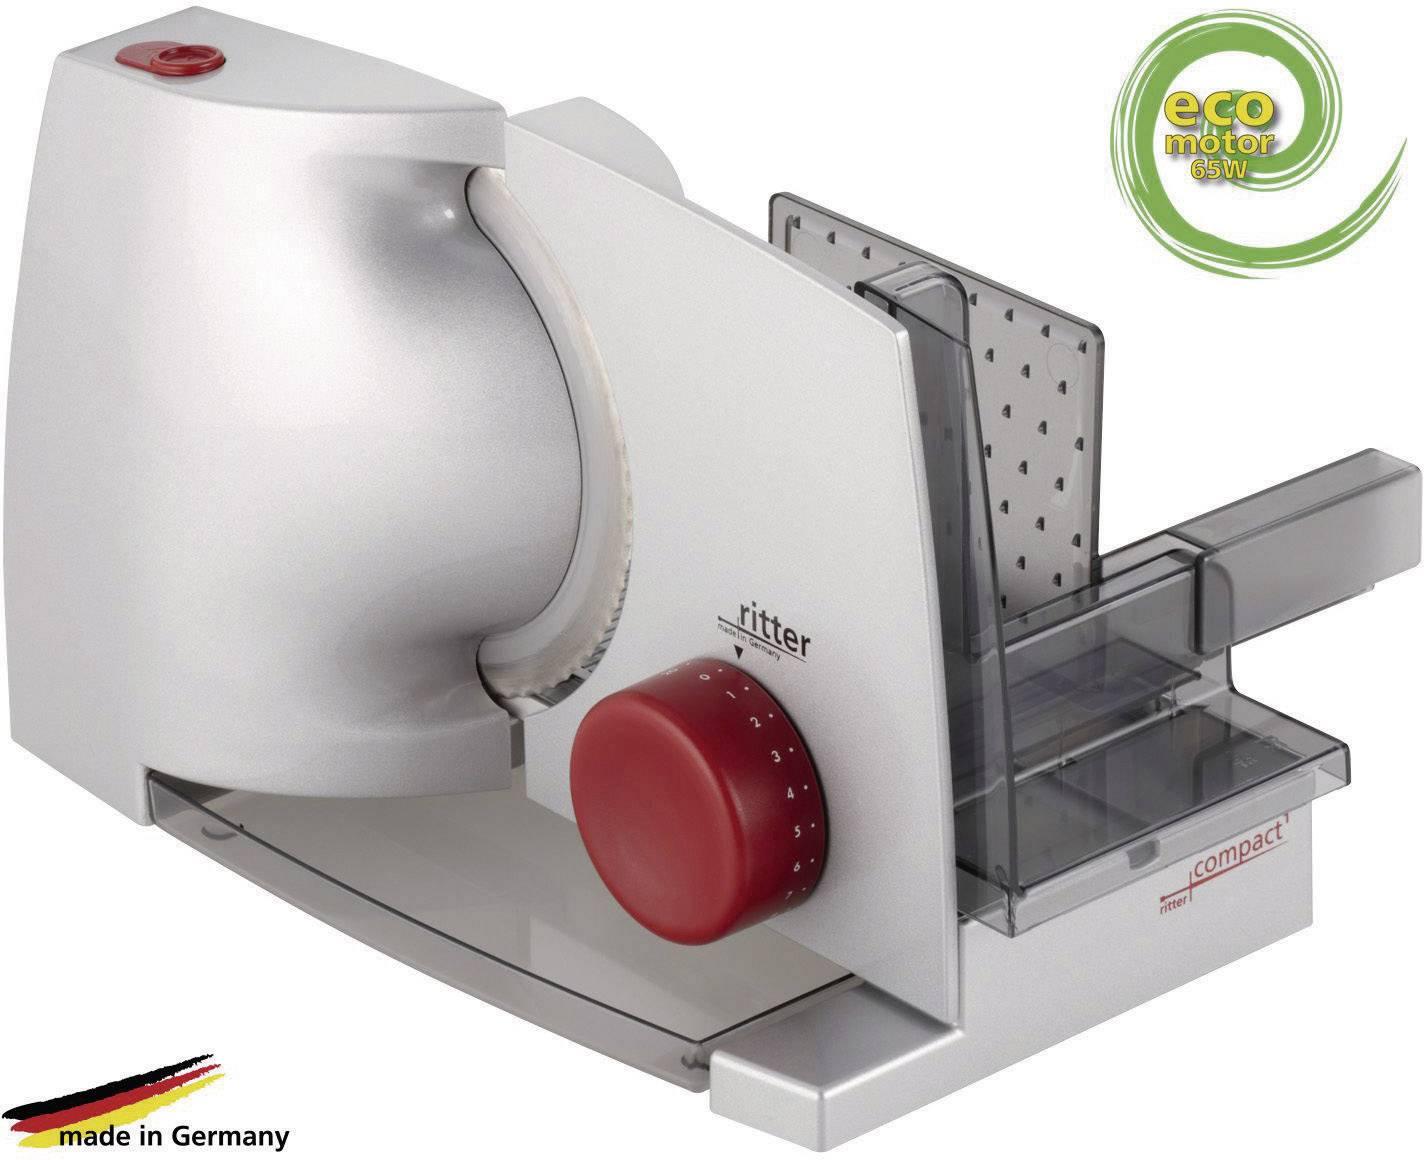 Kráječ potravin Ritterwerk Compact 1, 518.000, 65 W, stříbrná/šedá